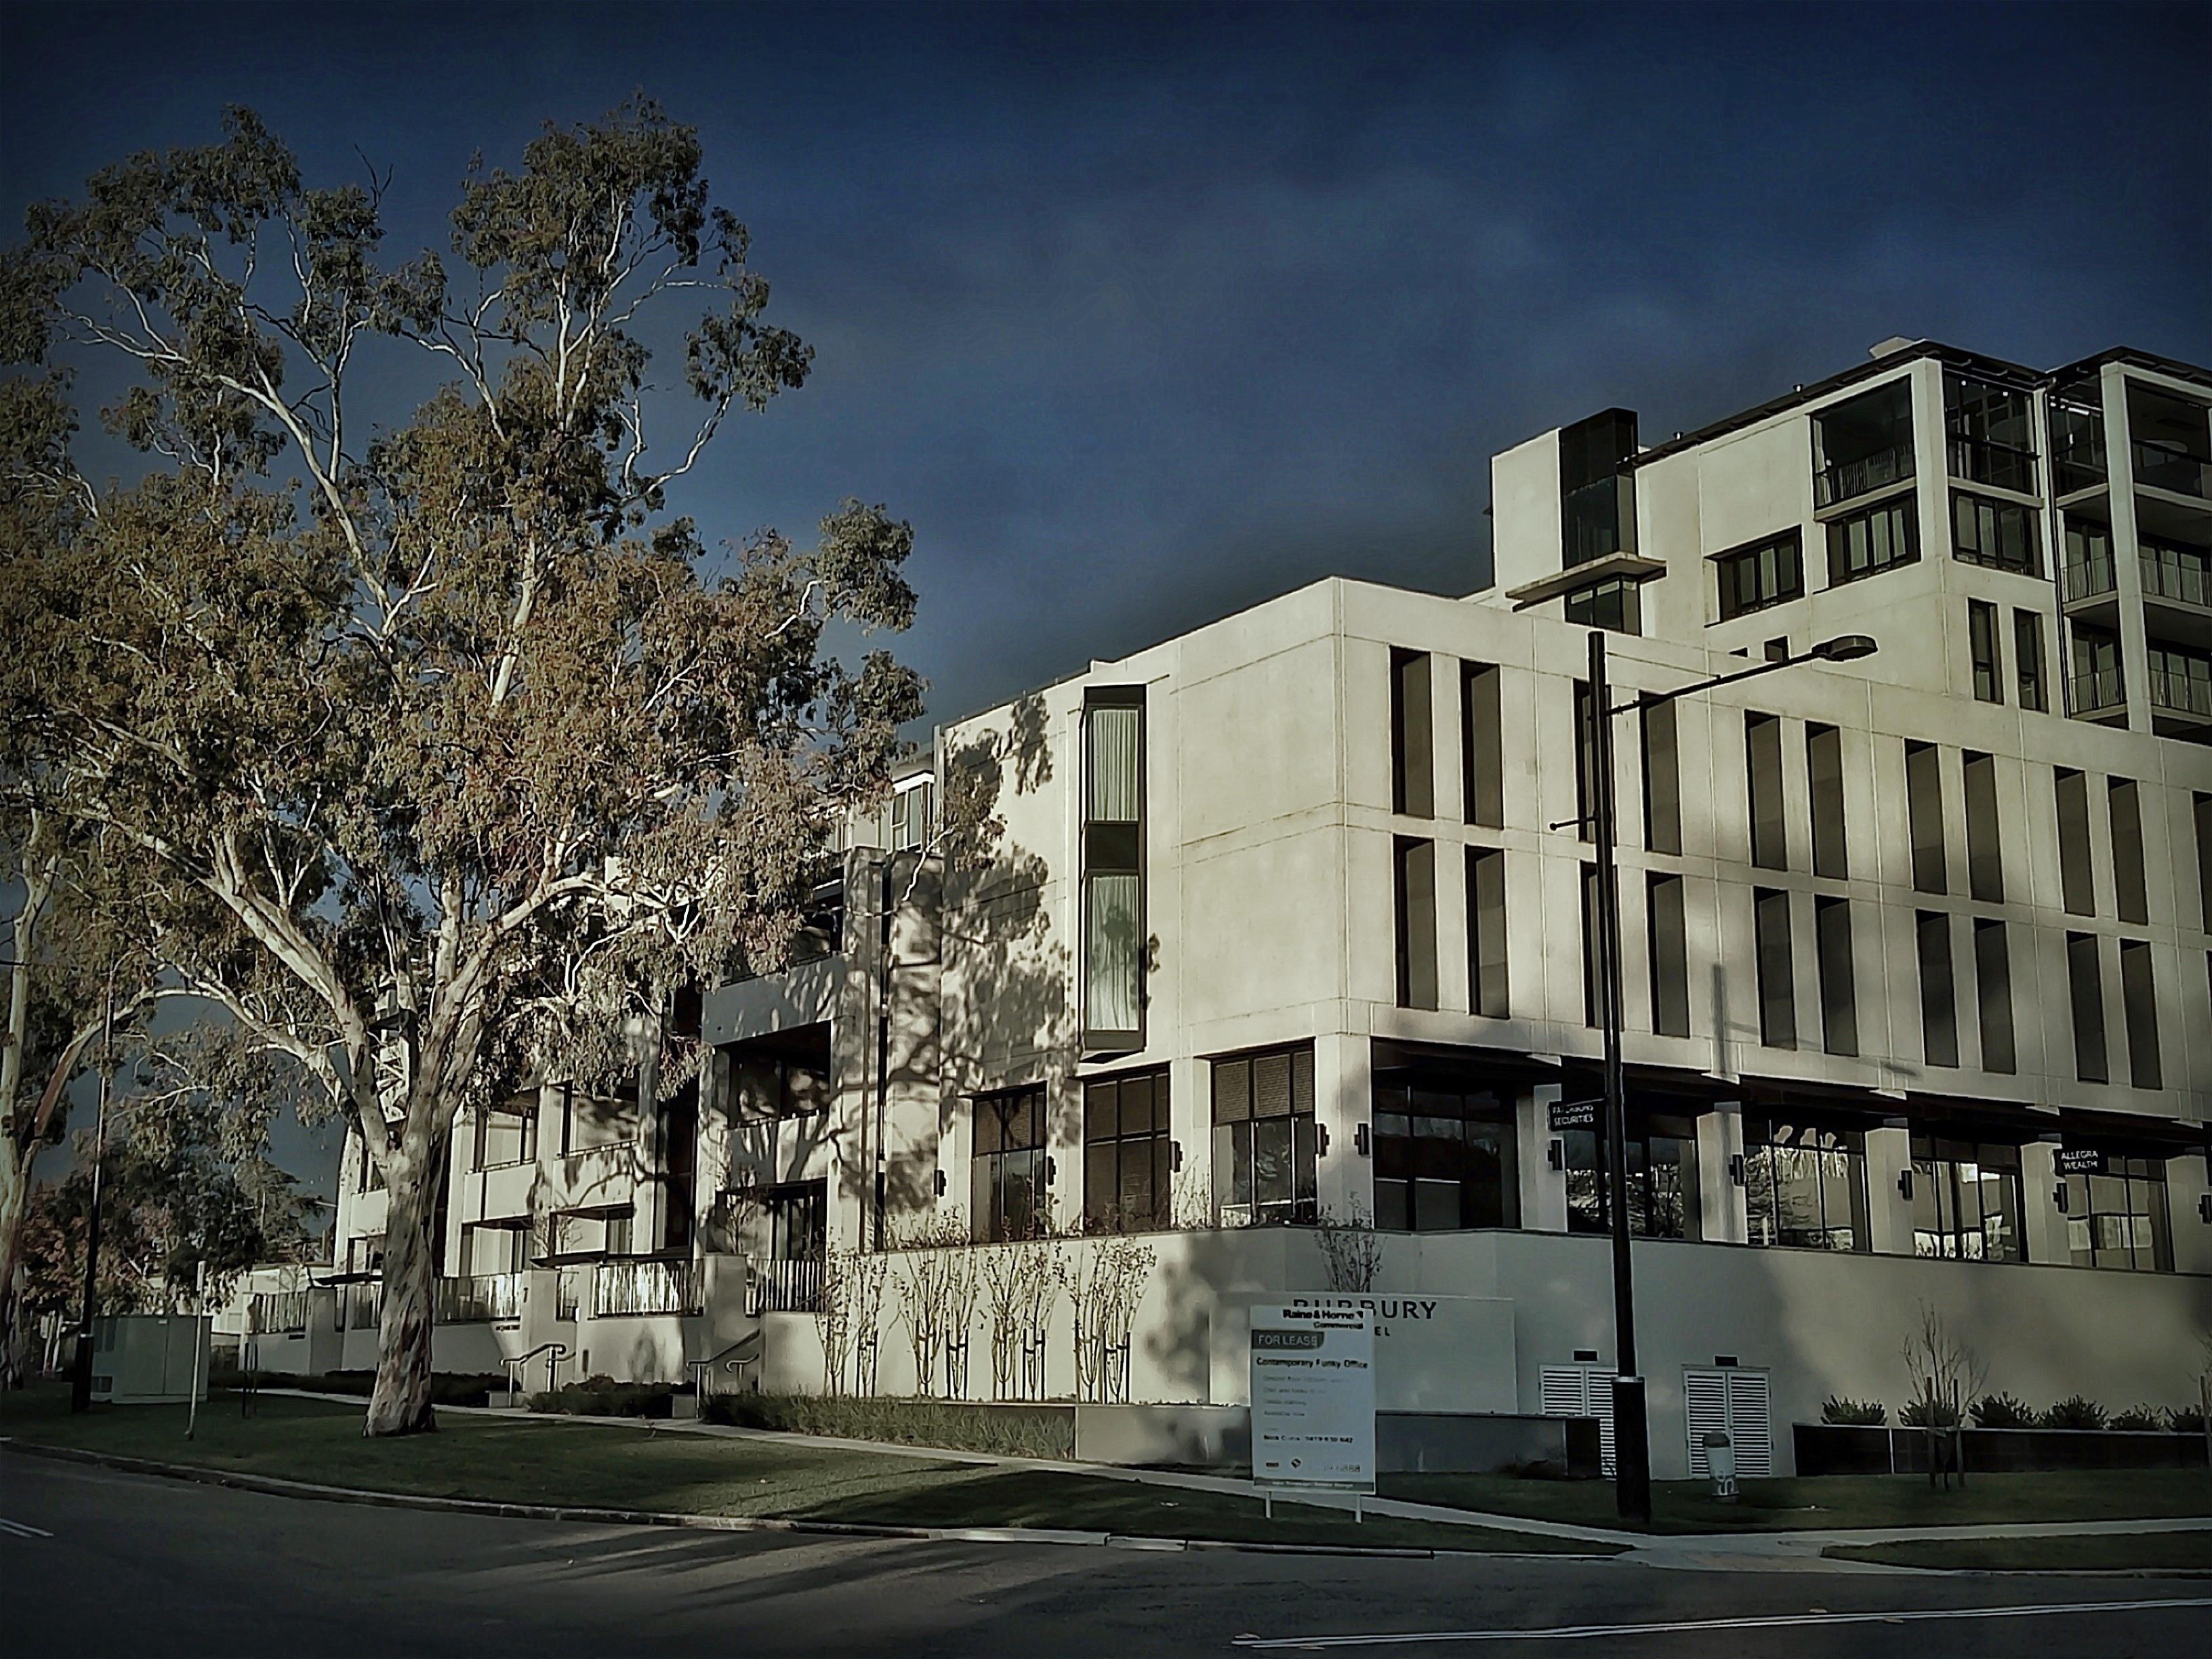 Barton Springs Apartments